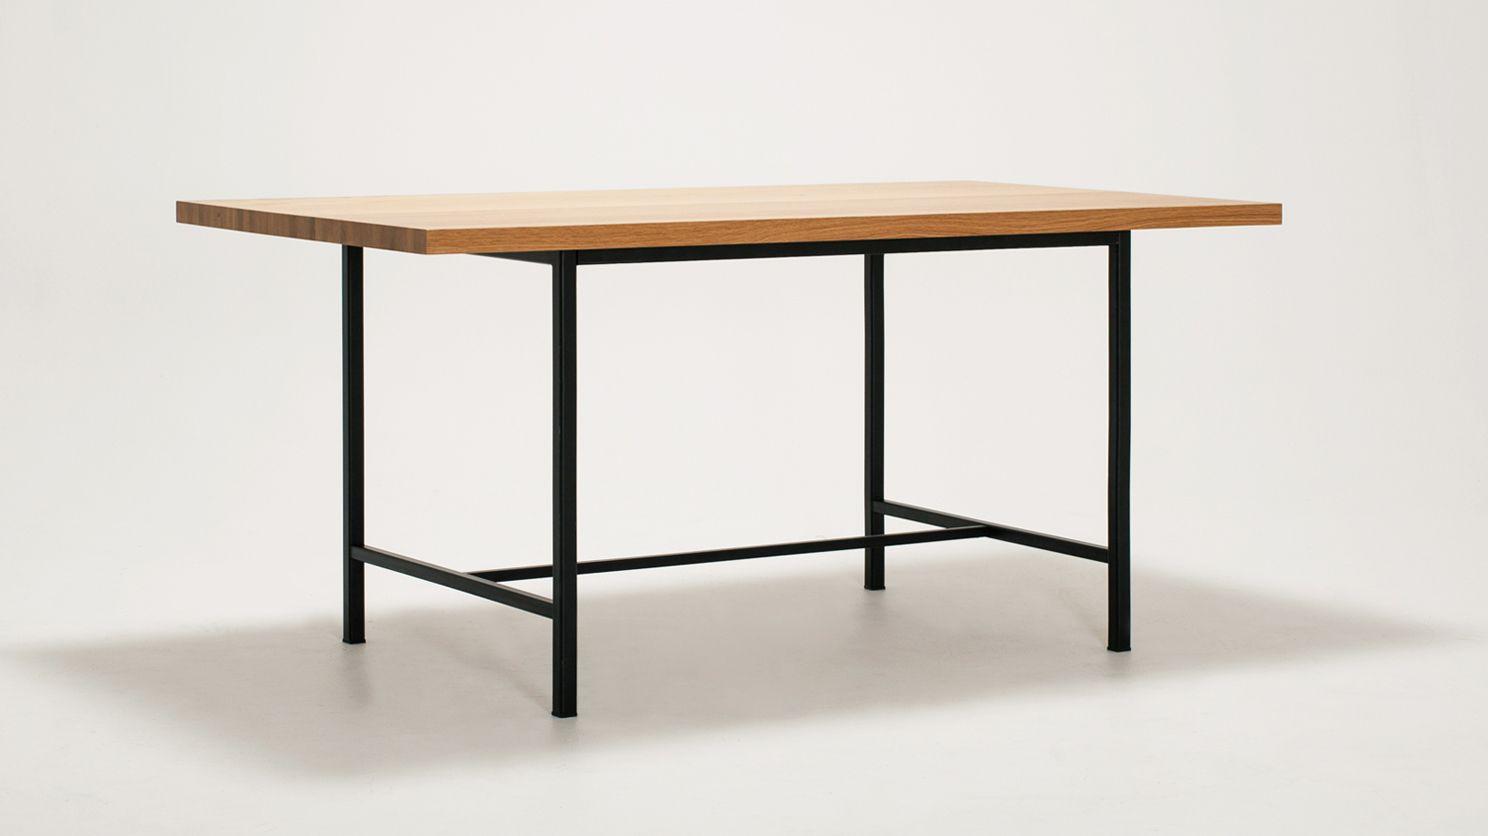 Taaj End Table  Eq3 Modern Furniture  Wish List  Pinterest Prepossessing Kendall Dining Room Review